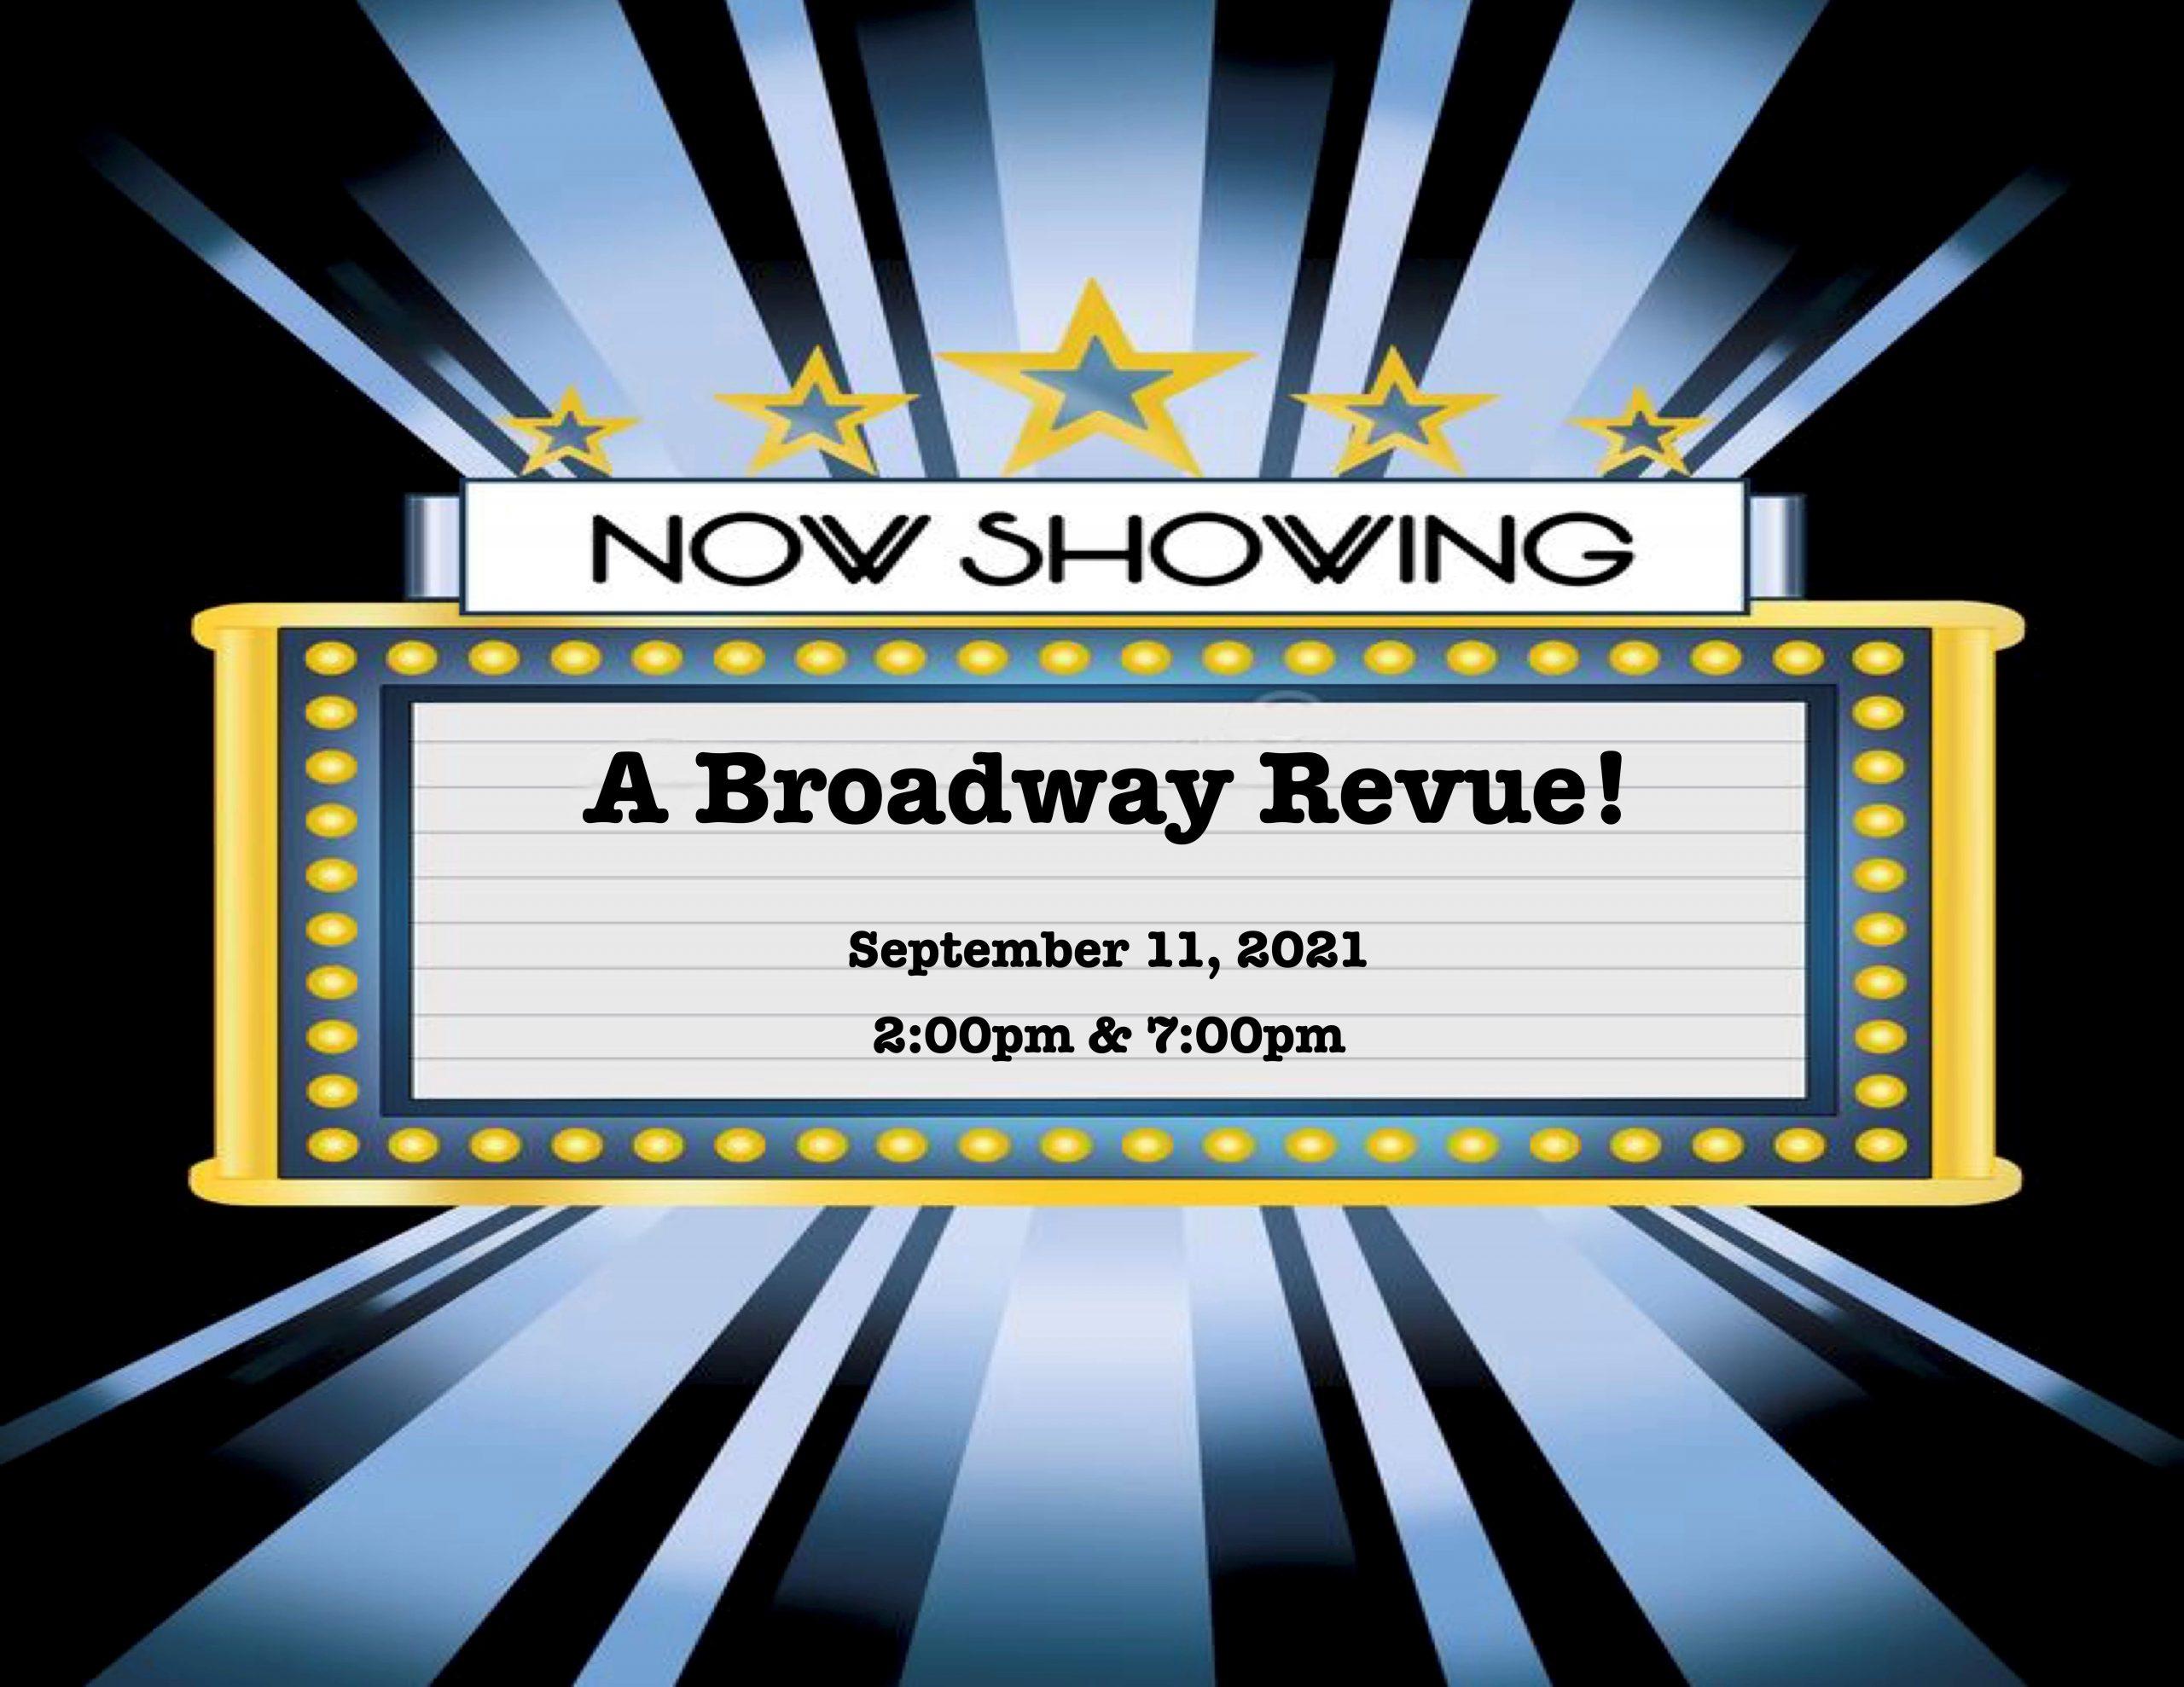 Broadway Revue Full Size